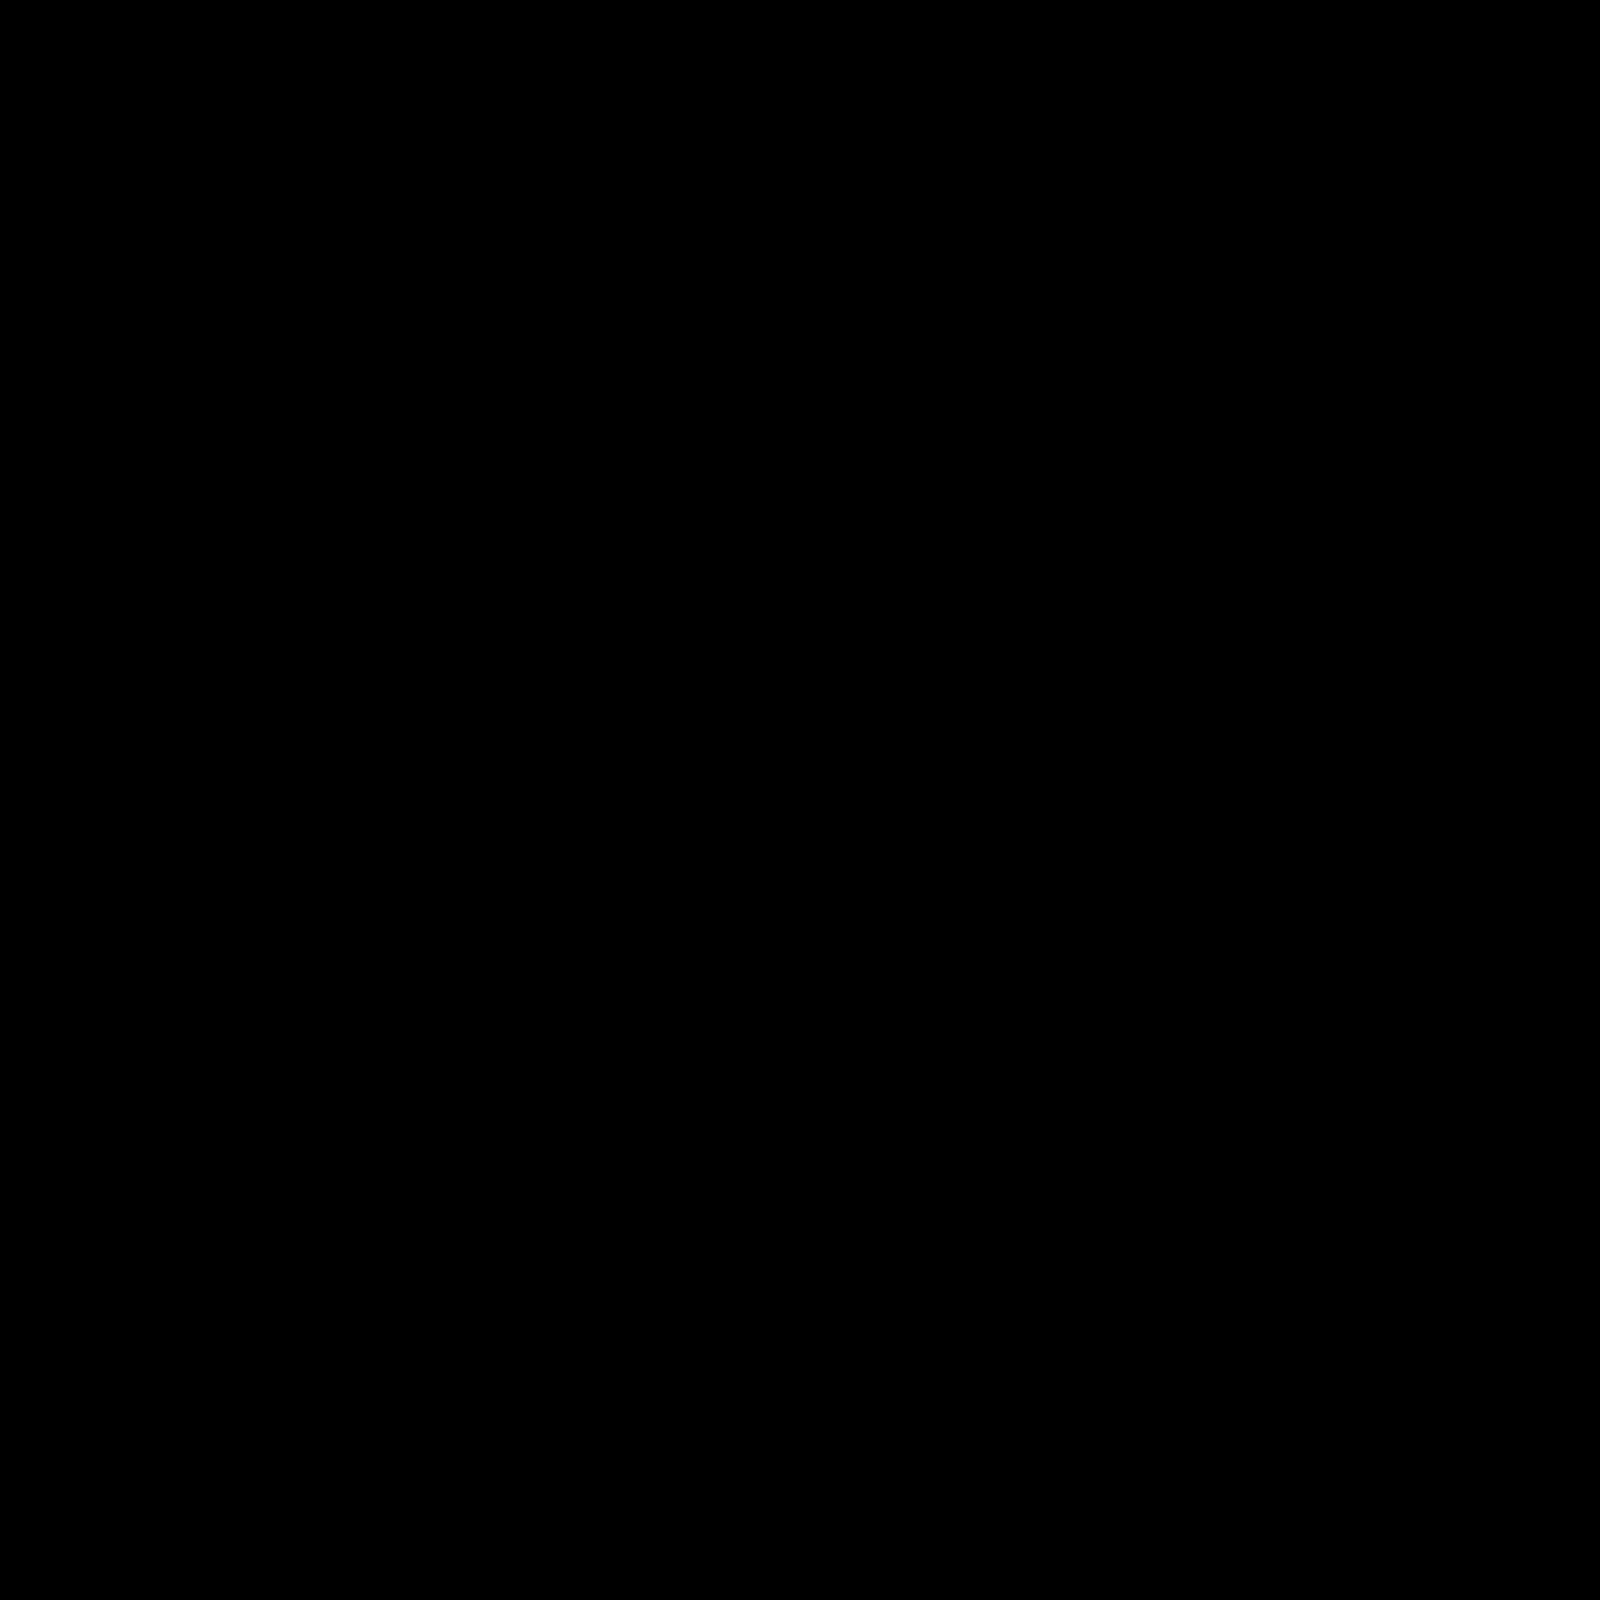 imadło icon